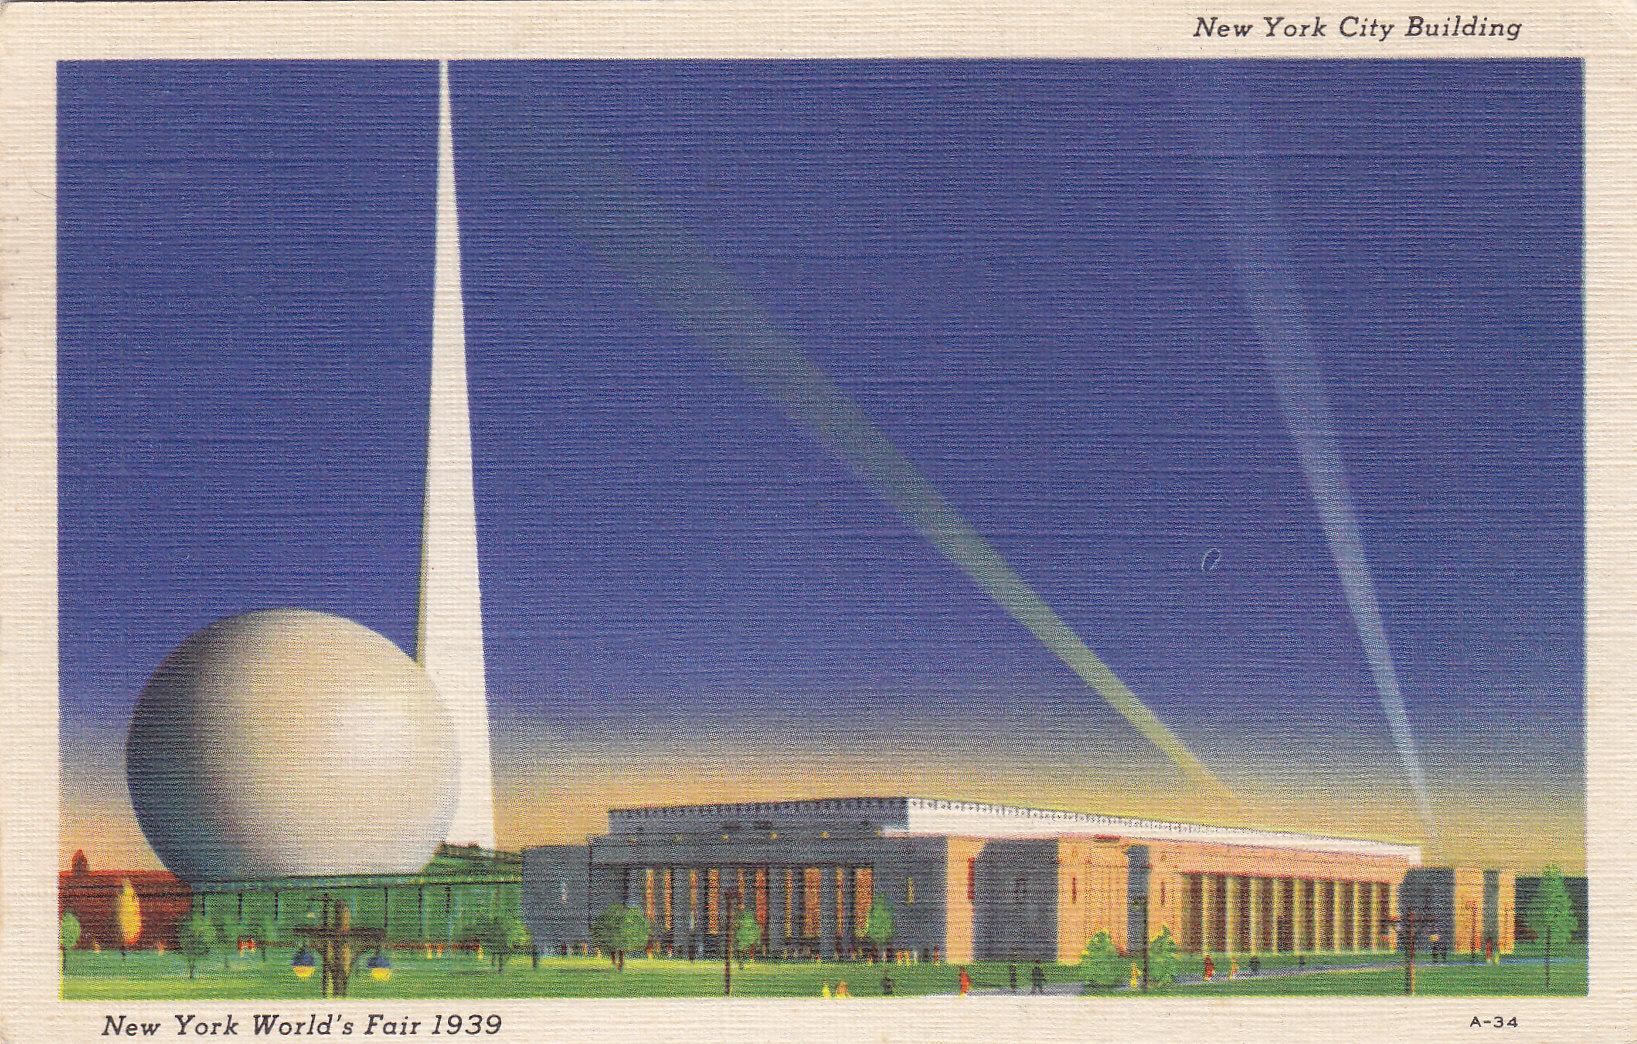 1939 New York World's Fair- New York City Building | Moore ...